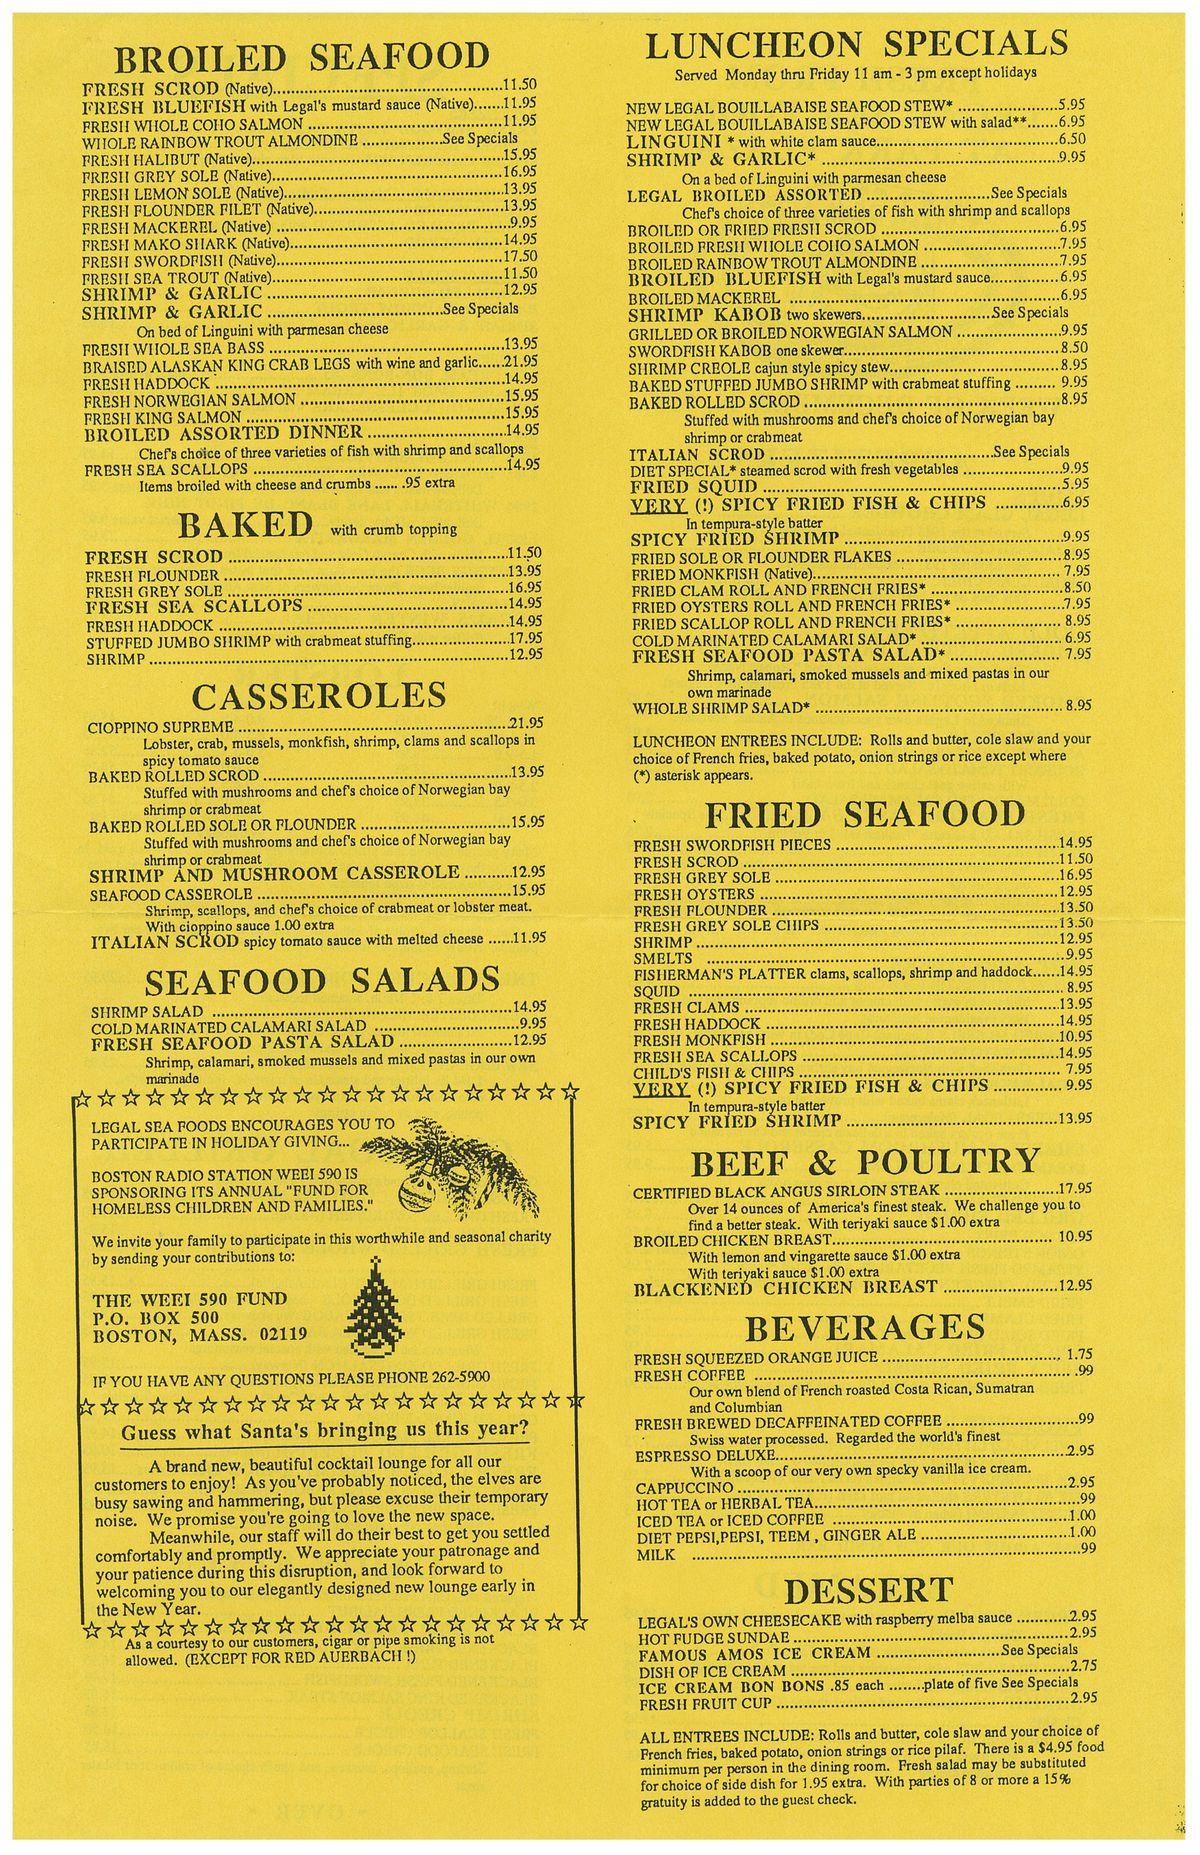 Legal Sea Foods menu 2 1987 park plaza